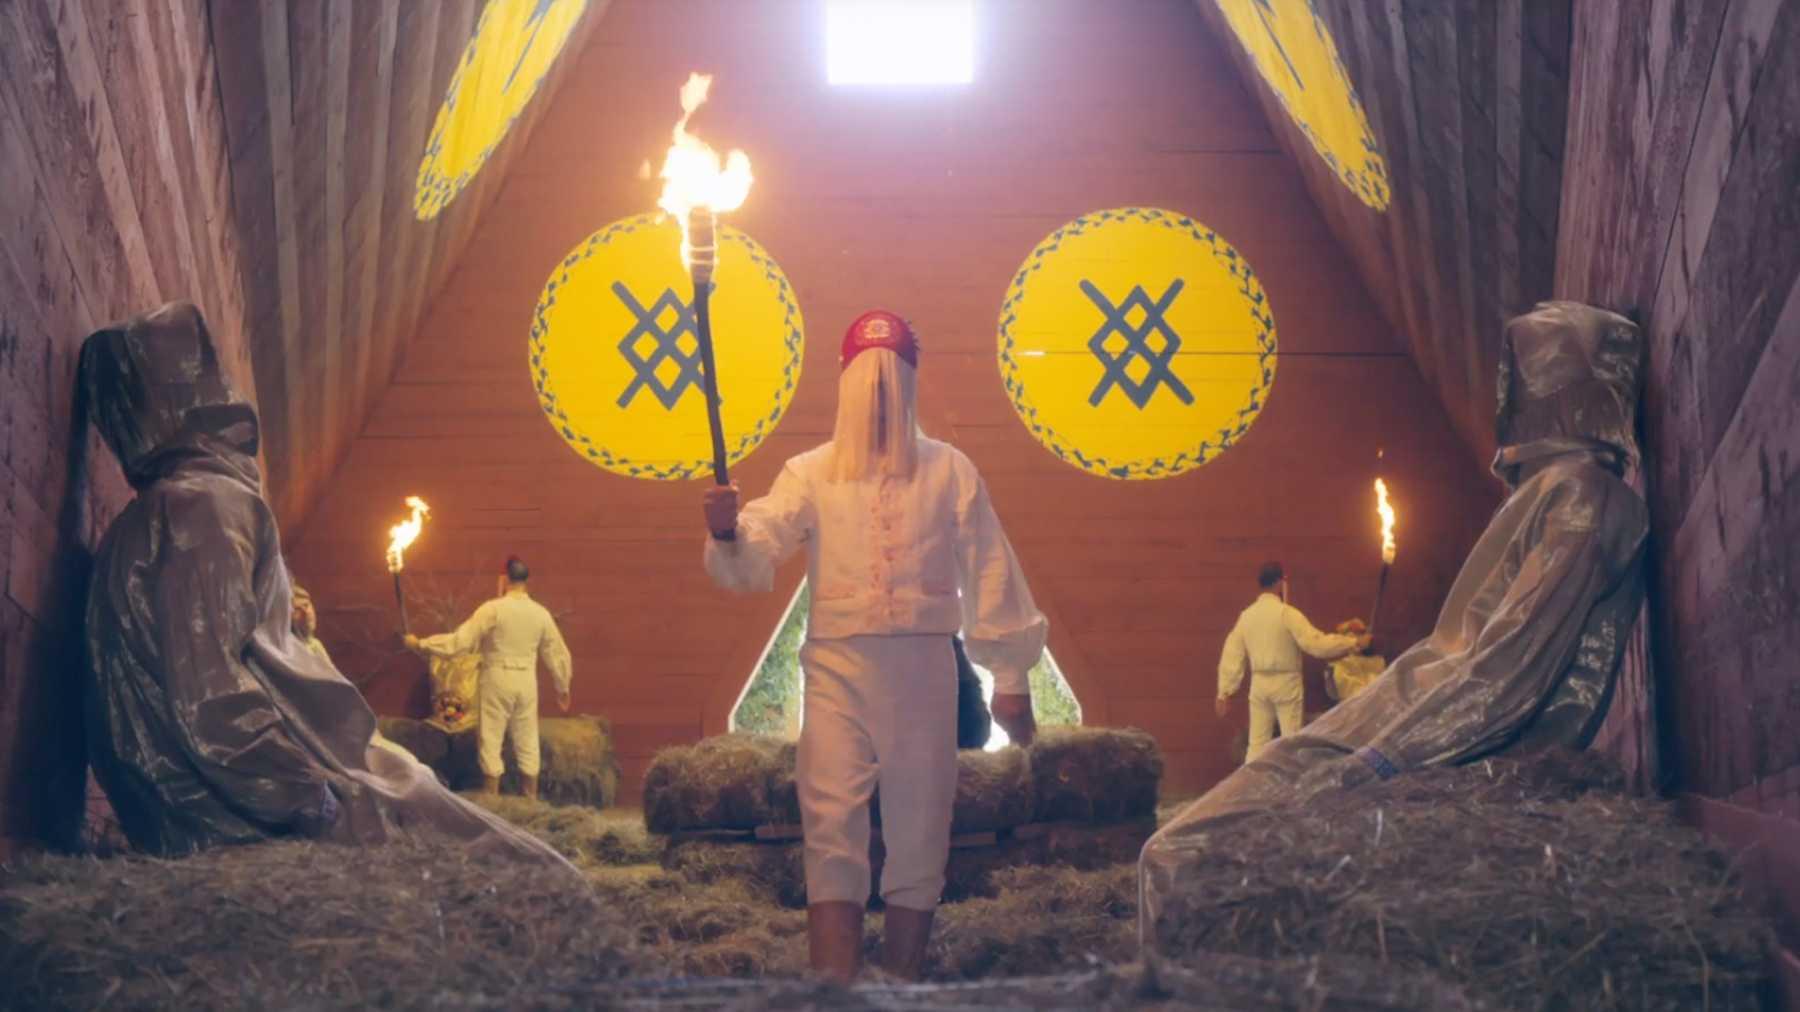 Ritual killing in Midsommar